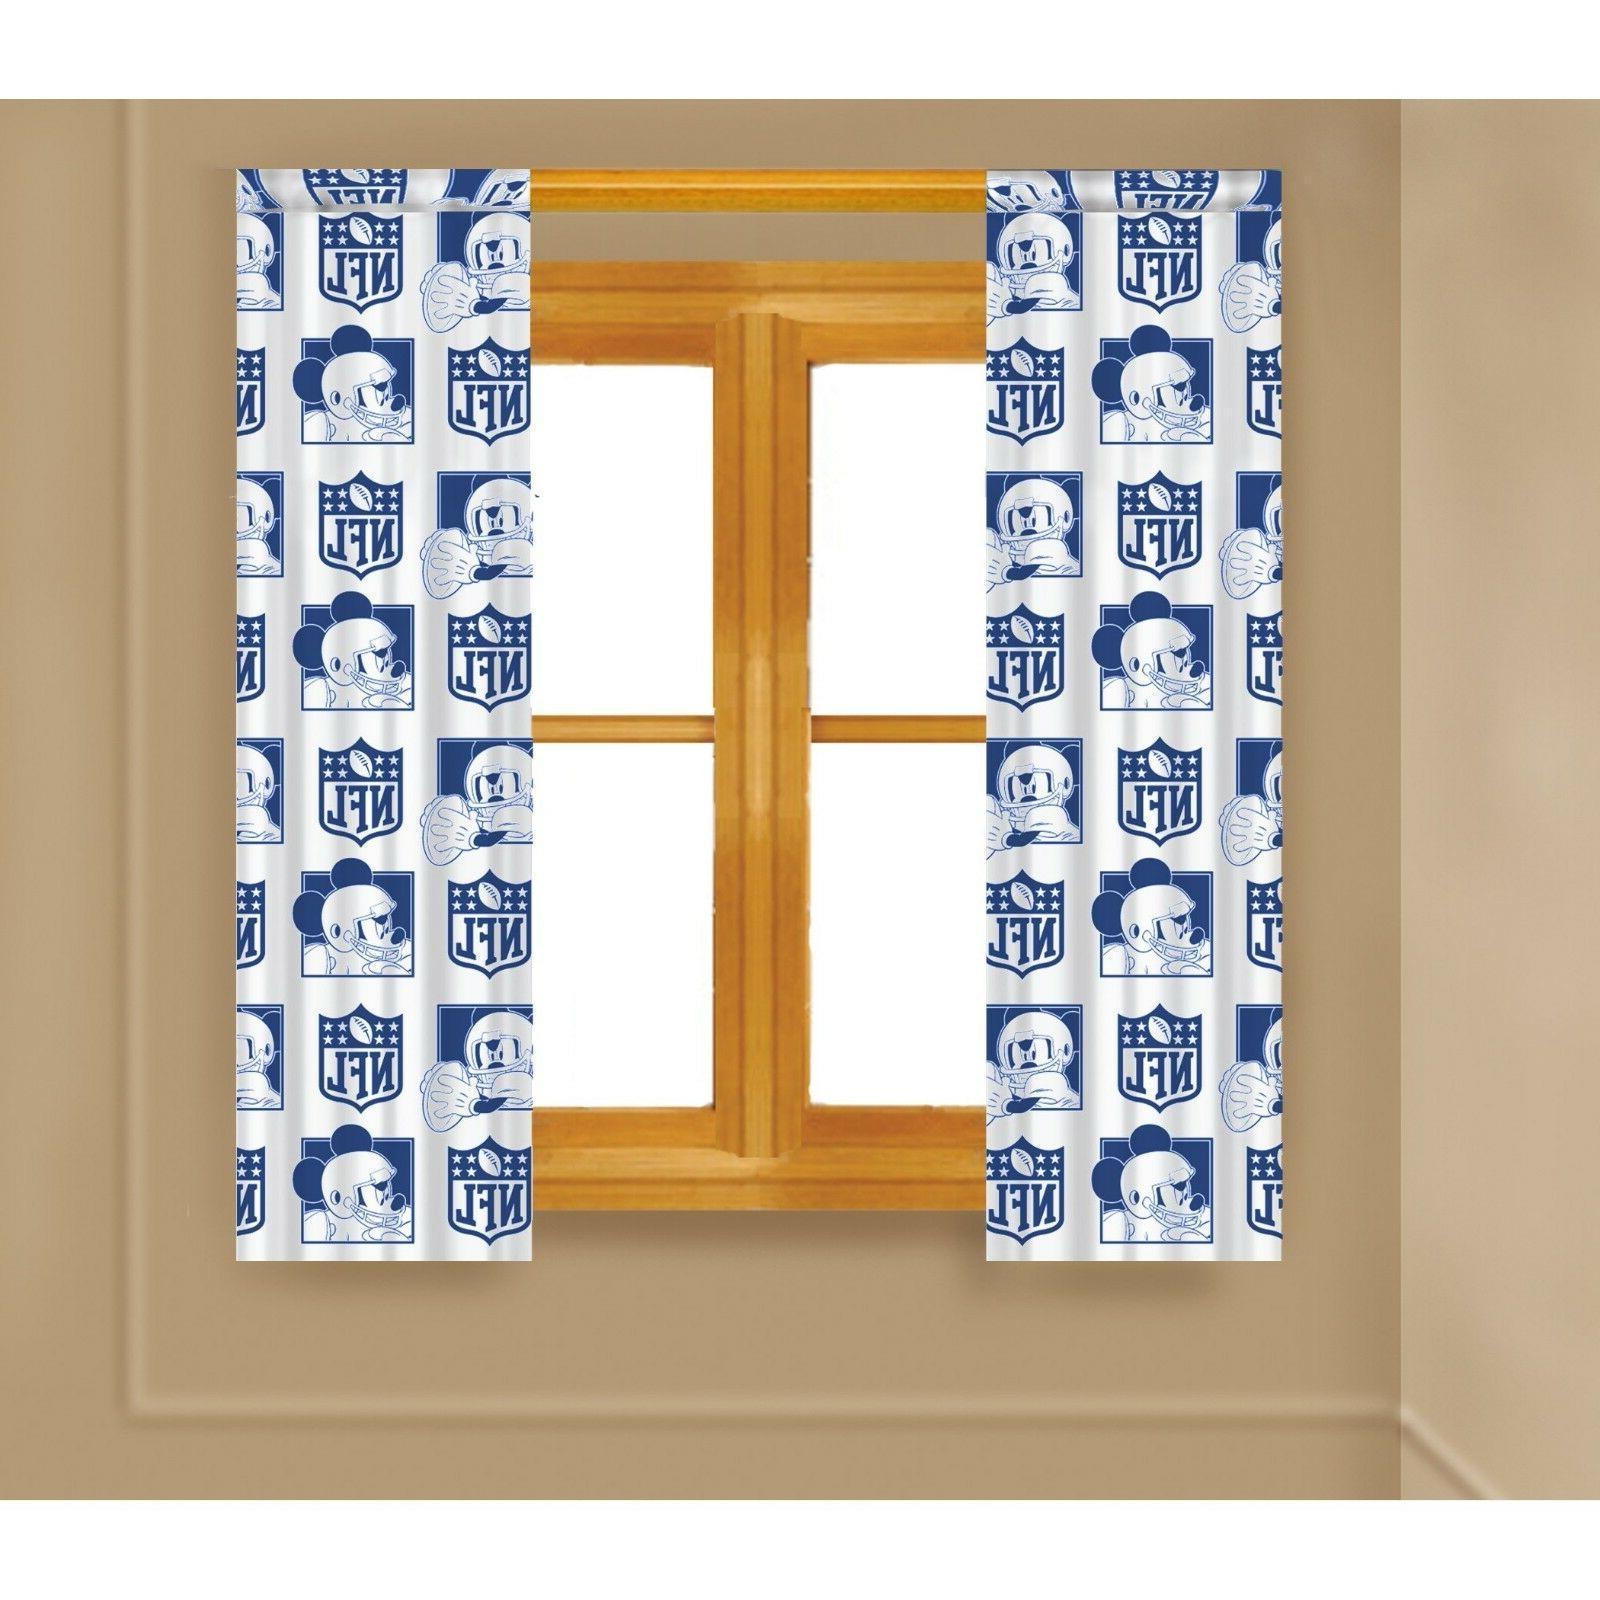 nfl dallas cowboys curtain panel